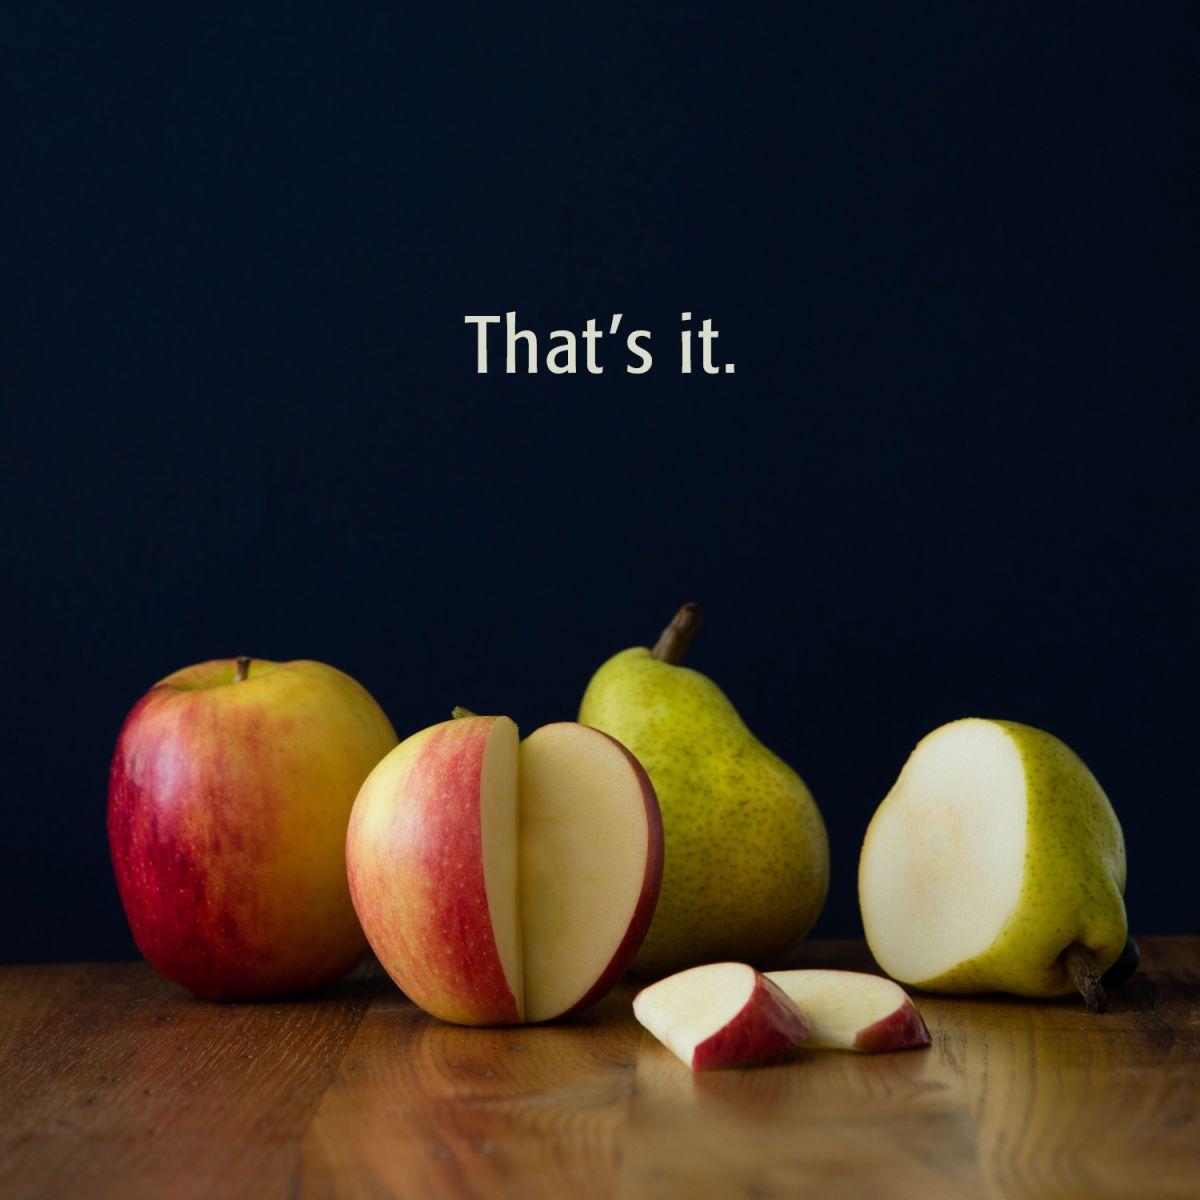 That's it. Fruit